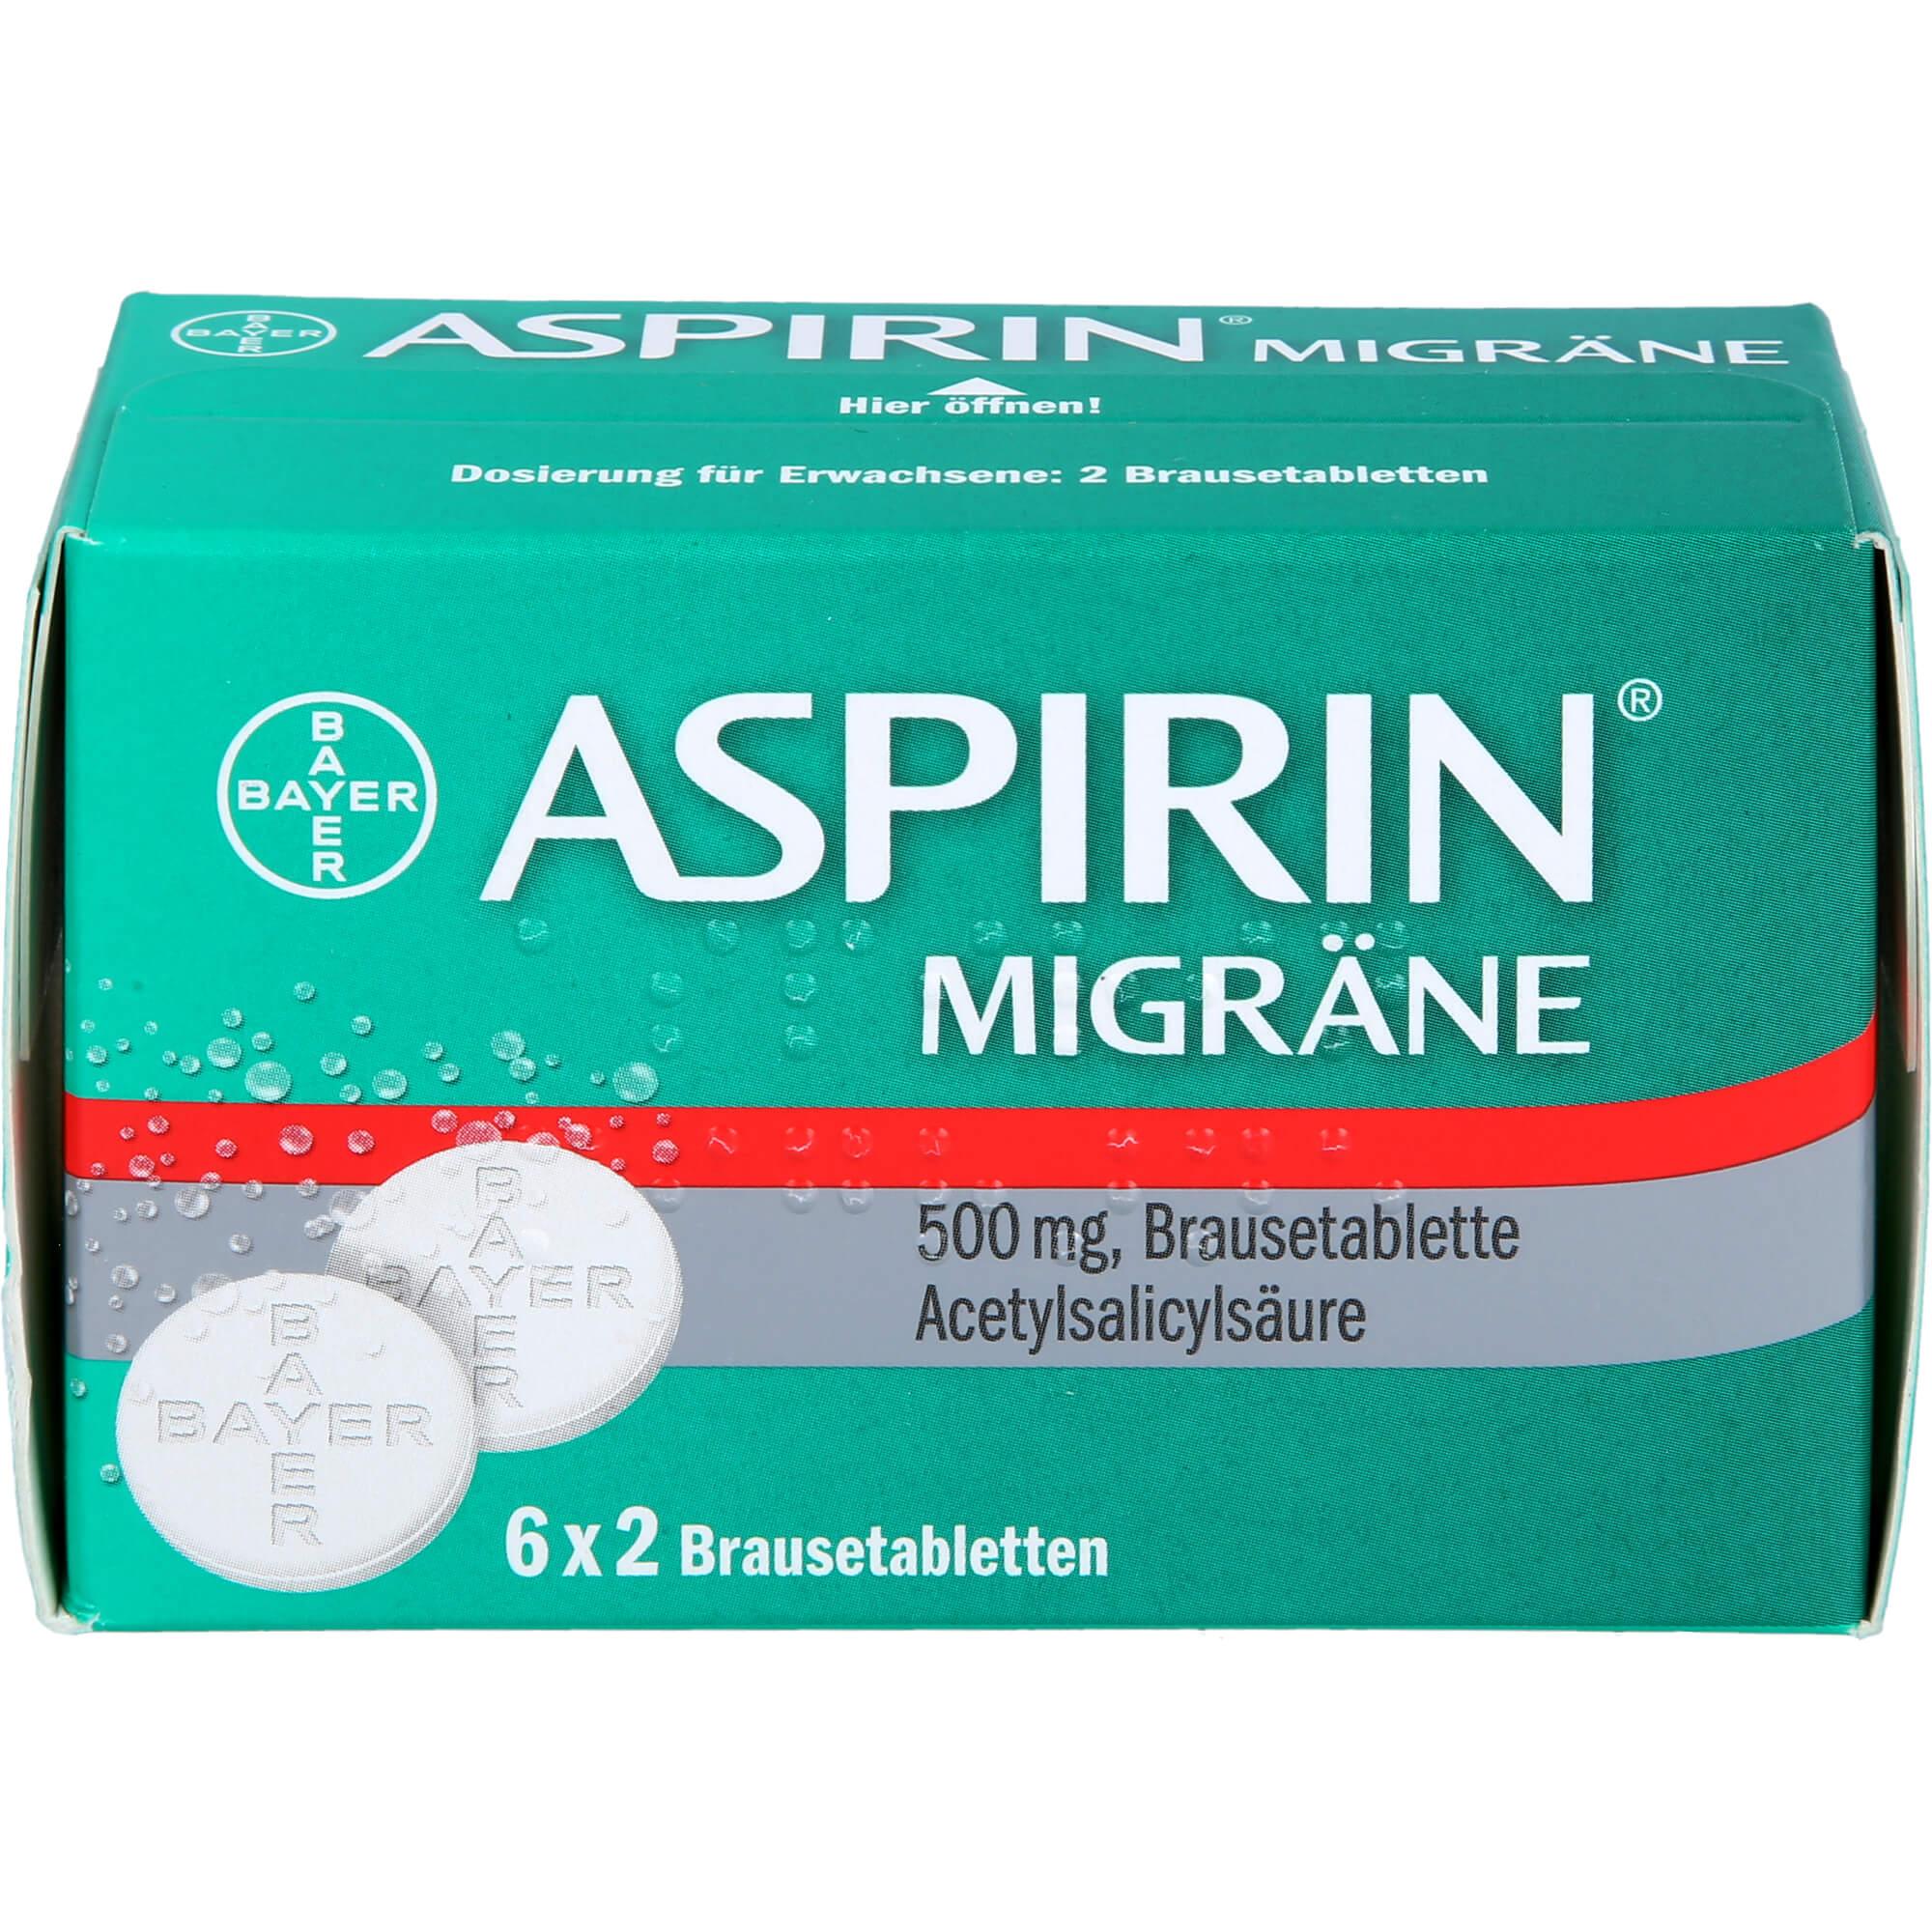 ASPIRIN-MIGRAeNE-Brausetabletten